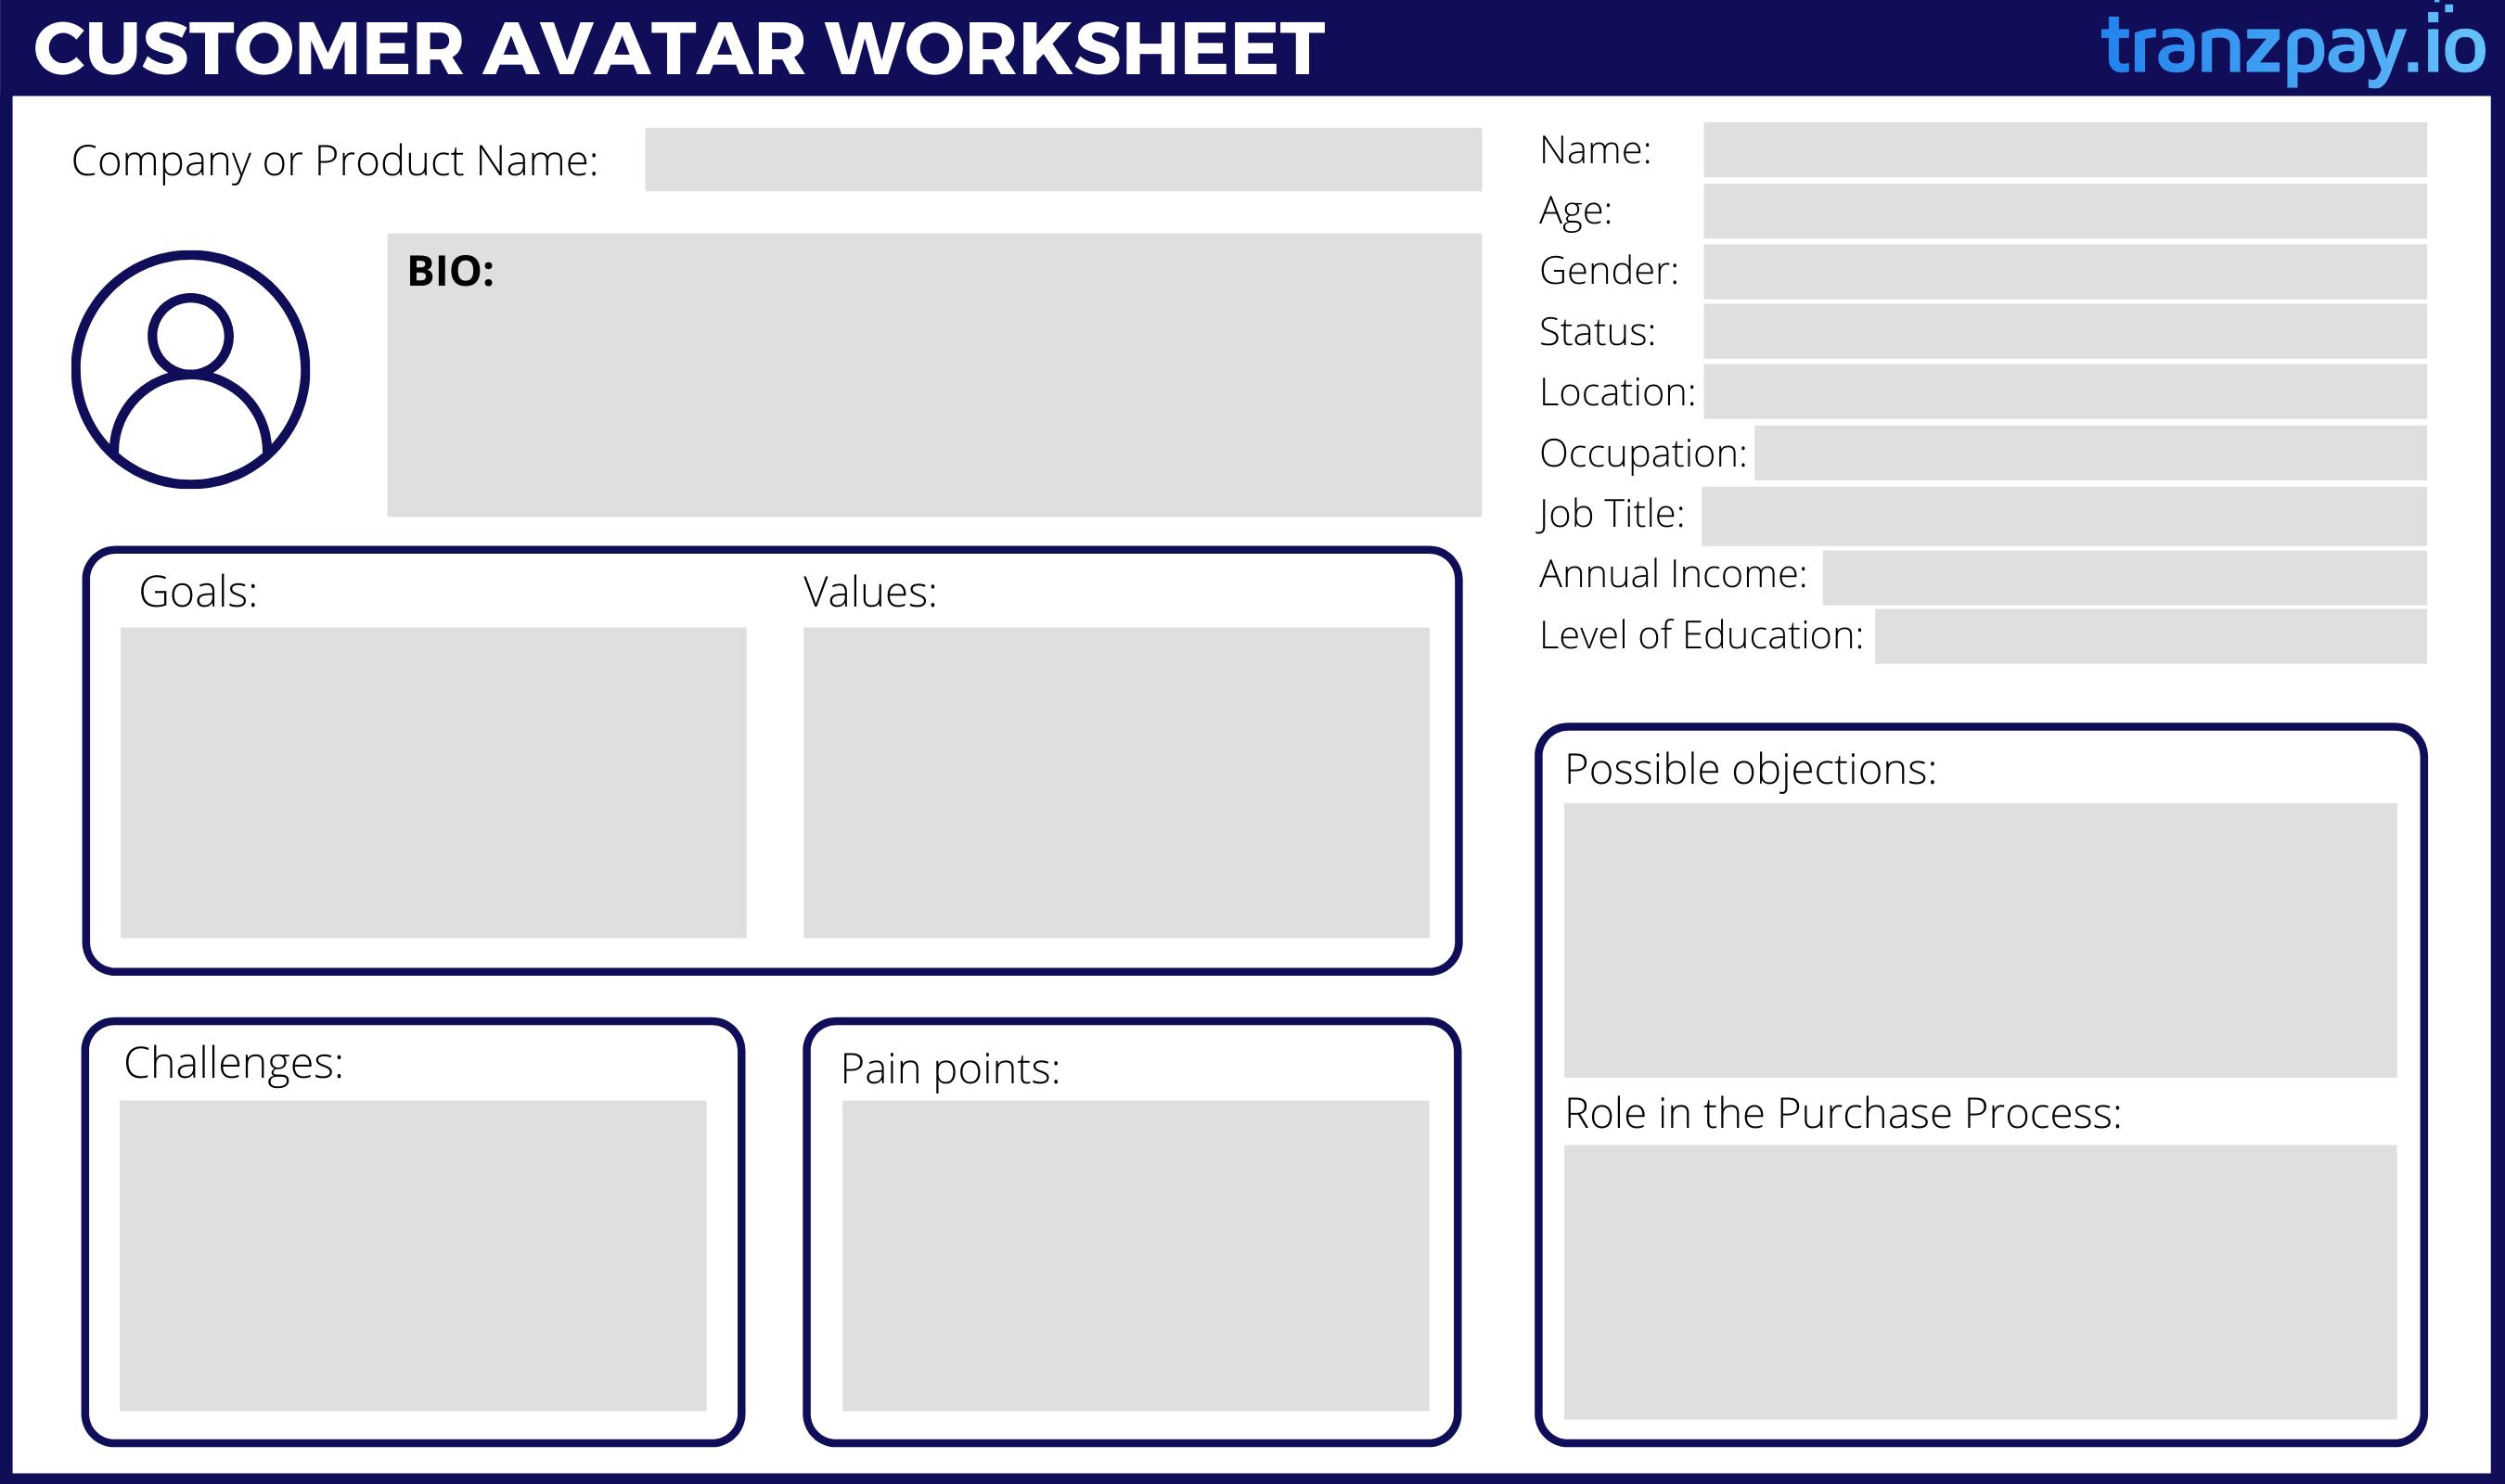 The Customer Avatar Worksheet